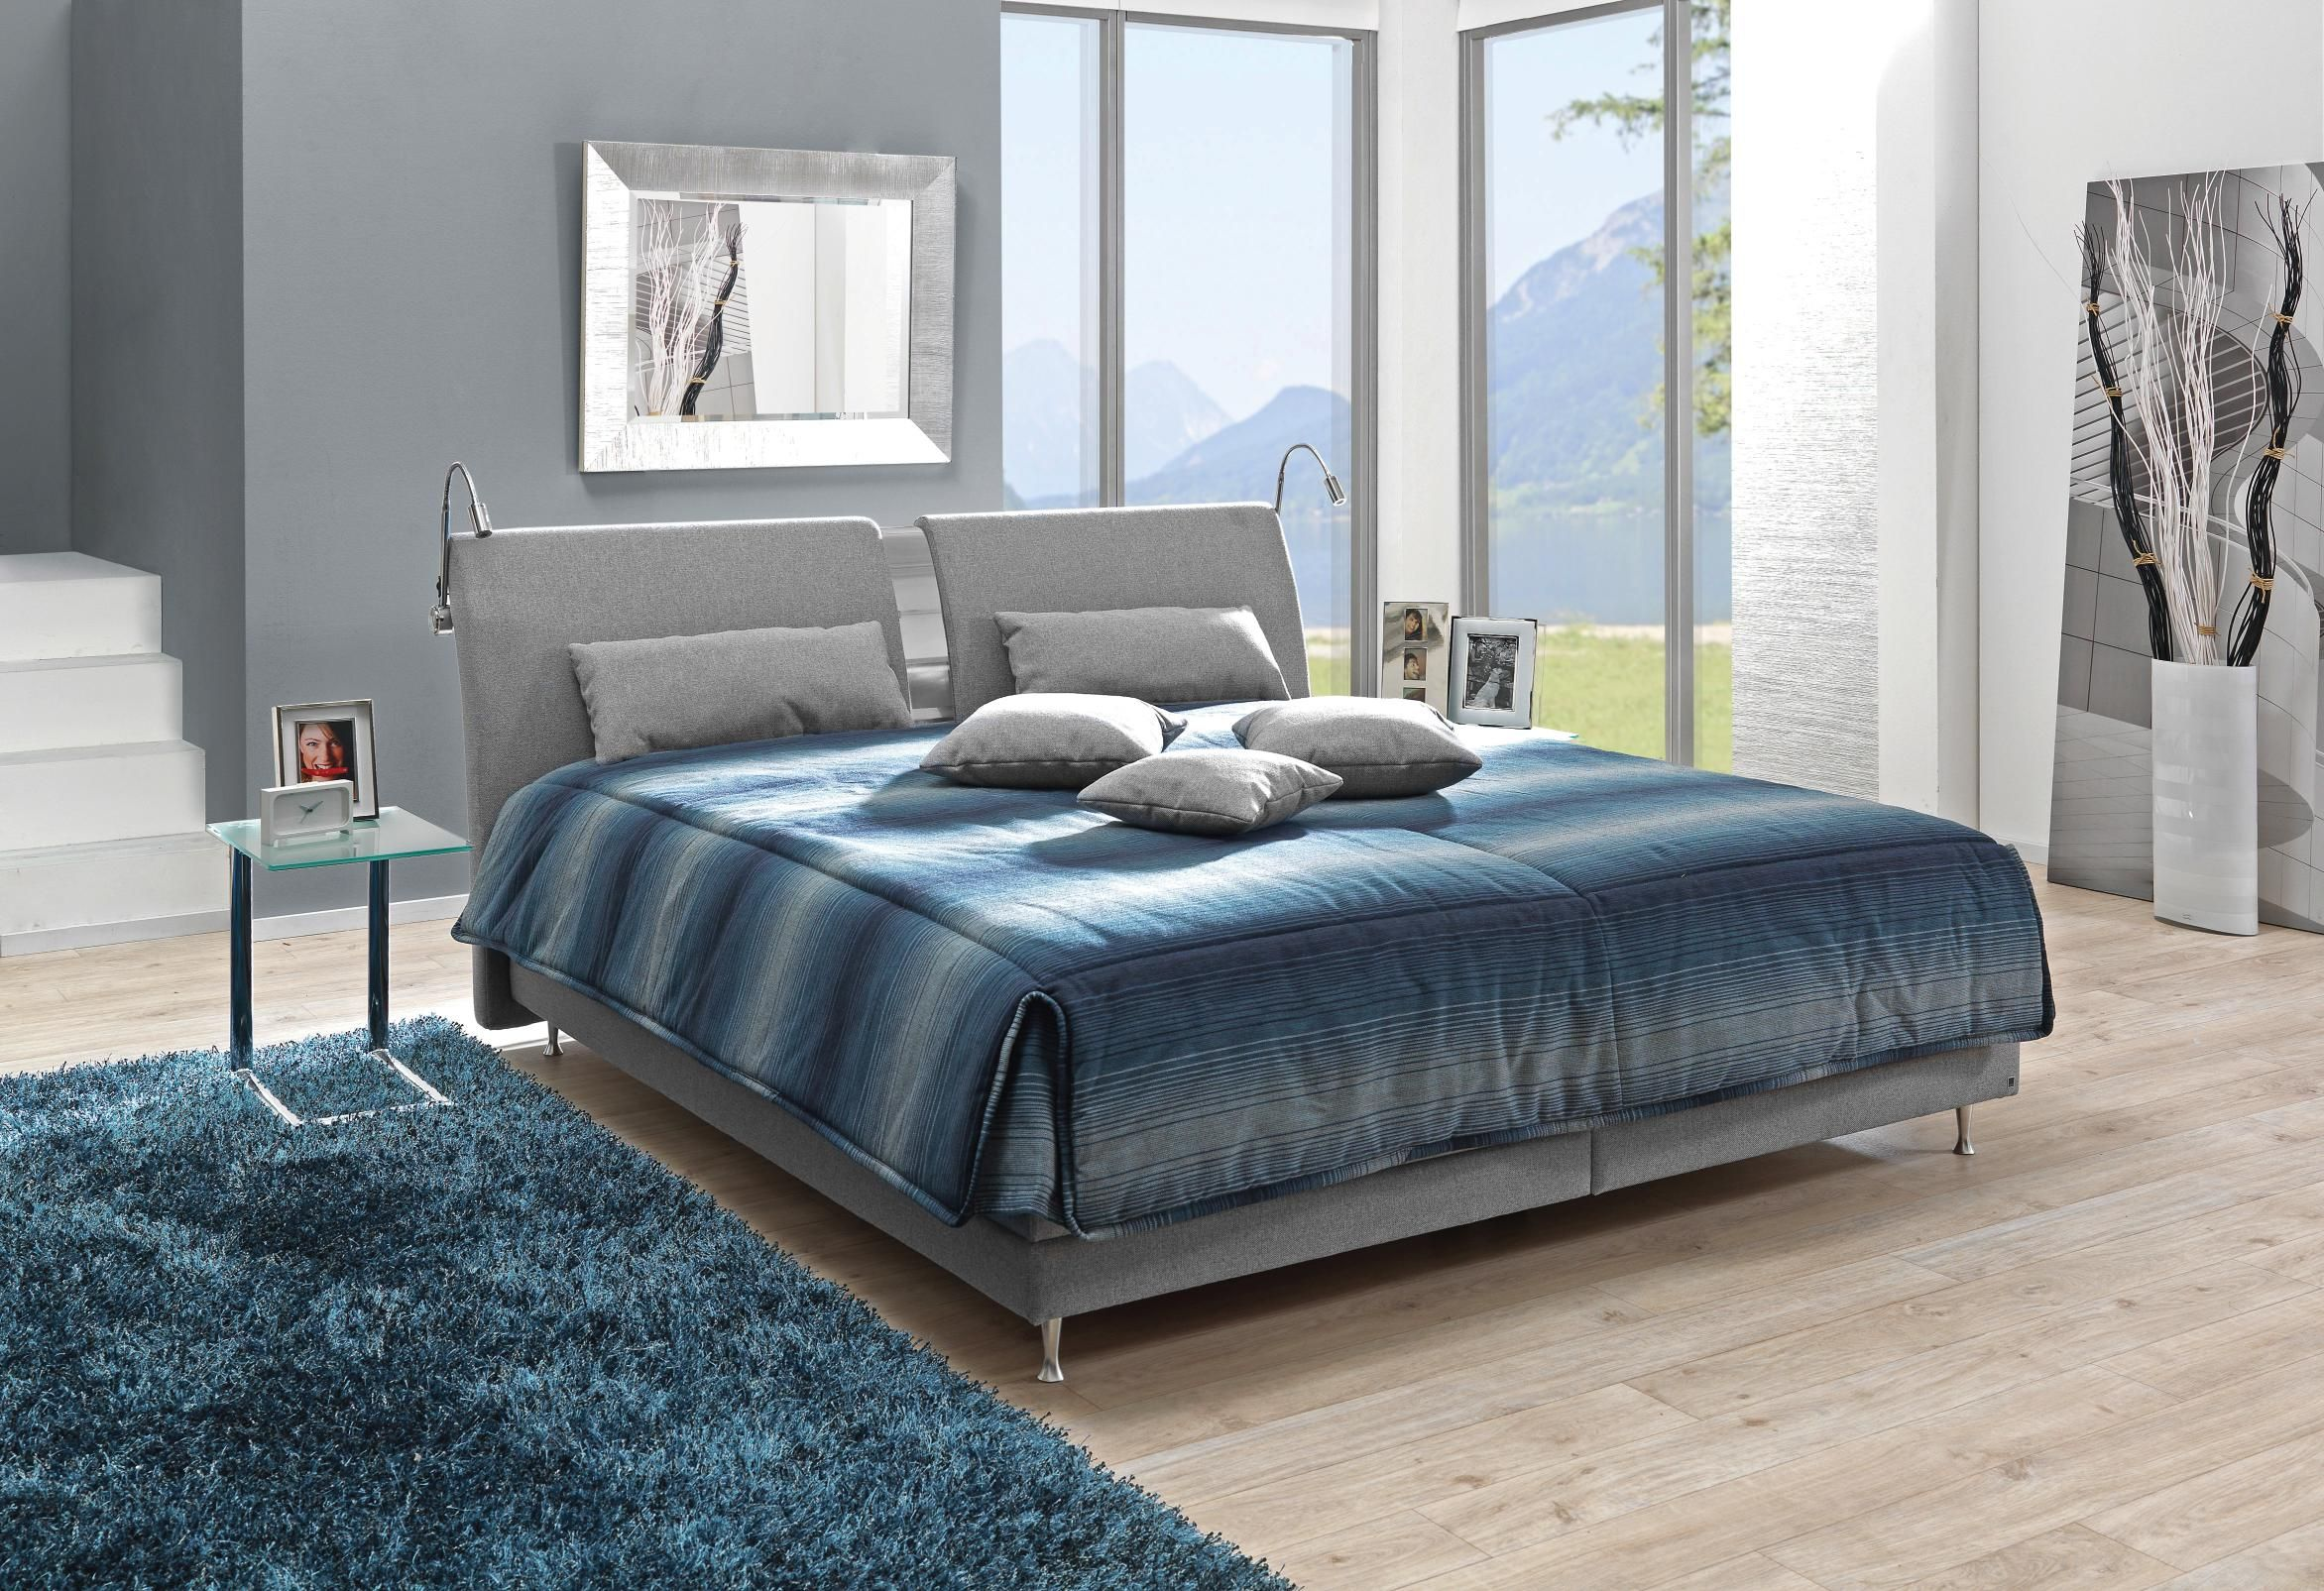 Graues Polsterbett Von Novel Edles Design Maximaler Komfort Furniture Home Bed